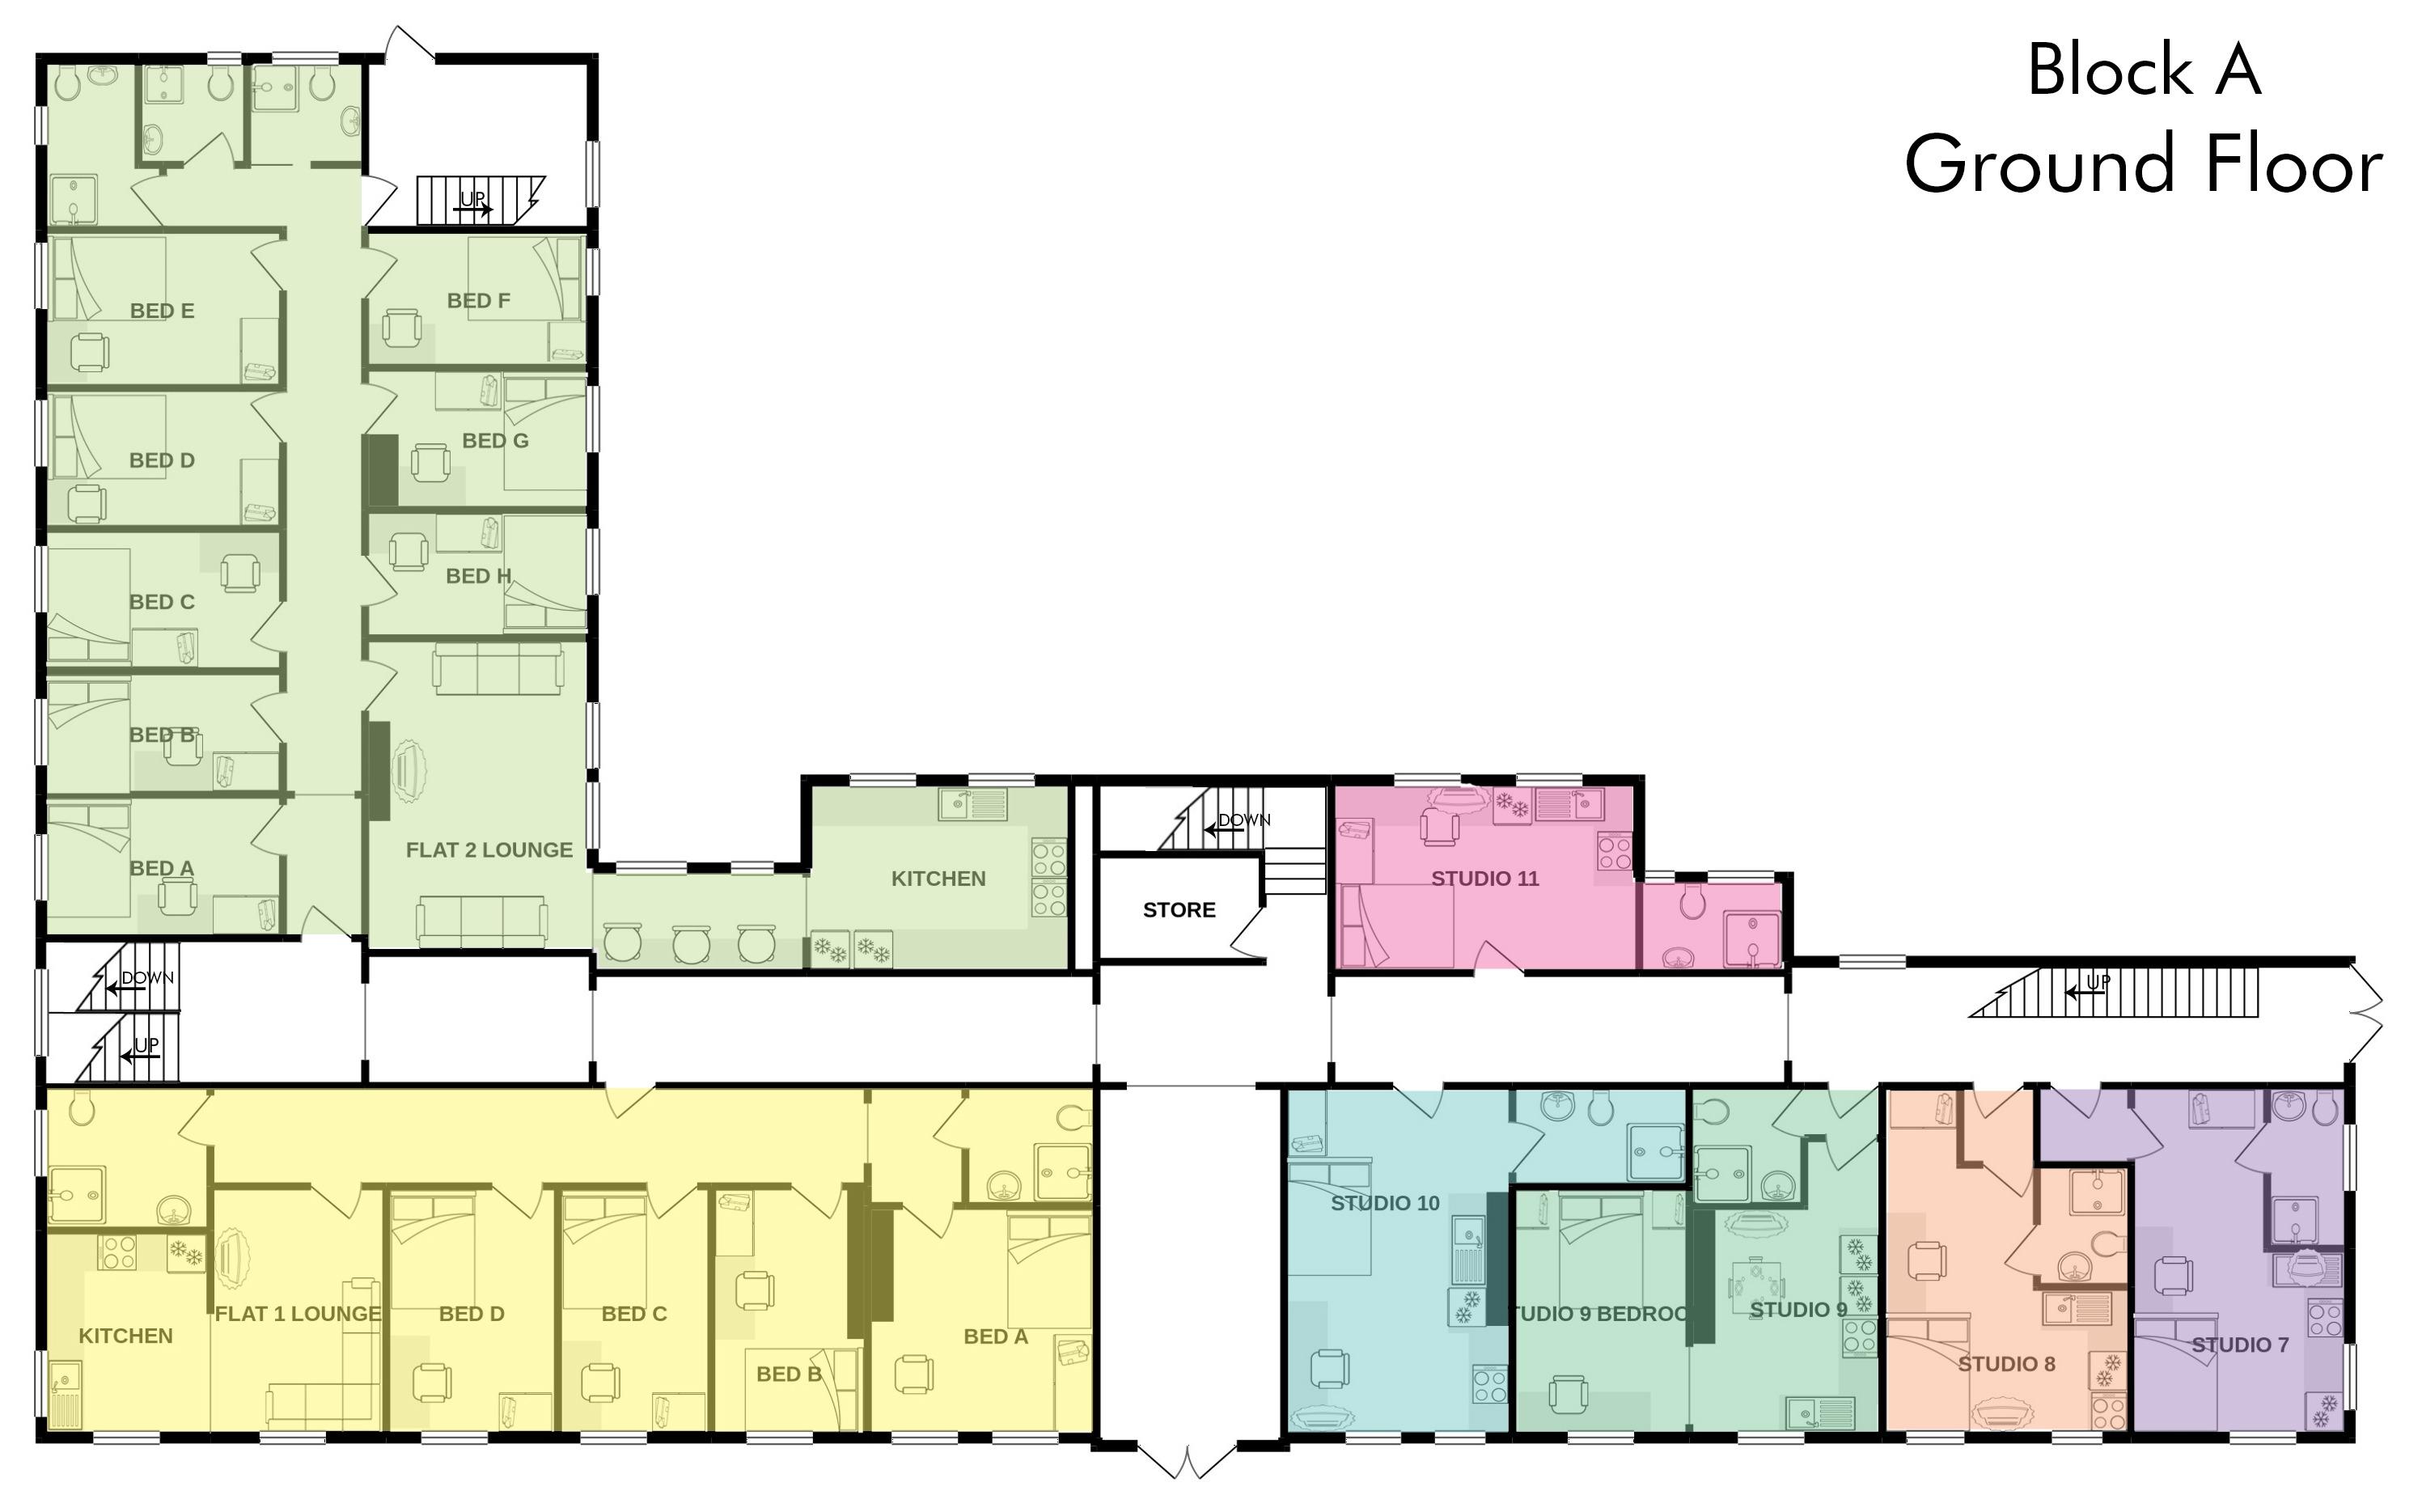 Studio 7, A City View floorplan